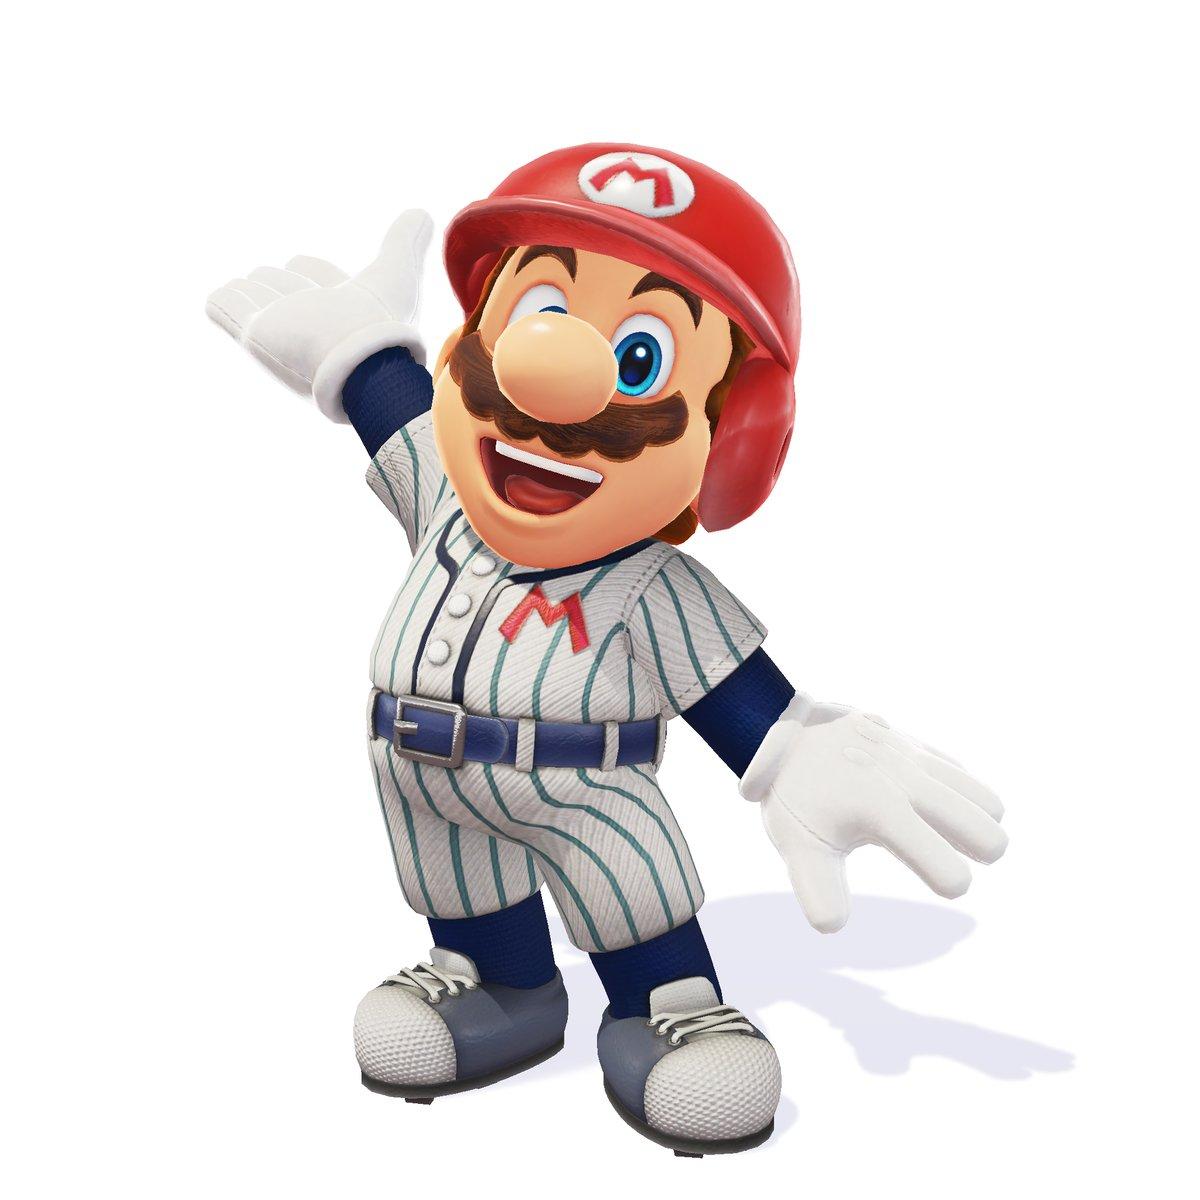 Super Mario Odyssey - Traje de béisbol